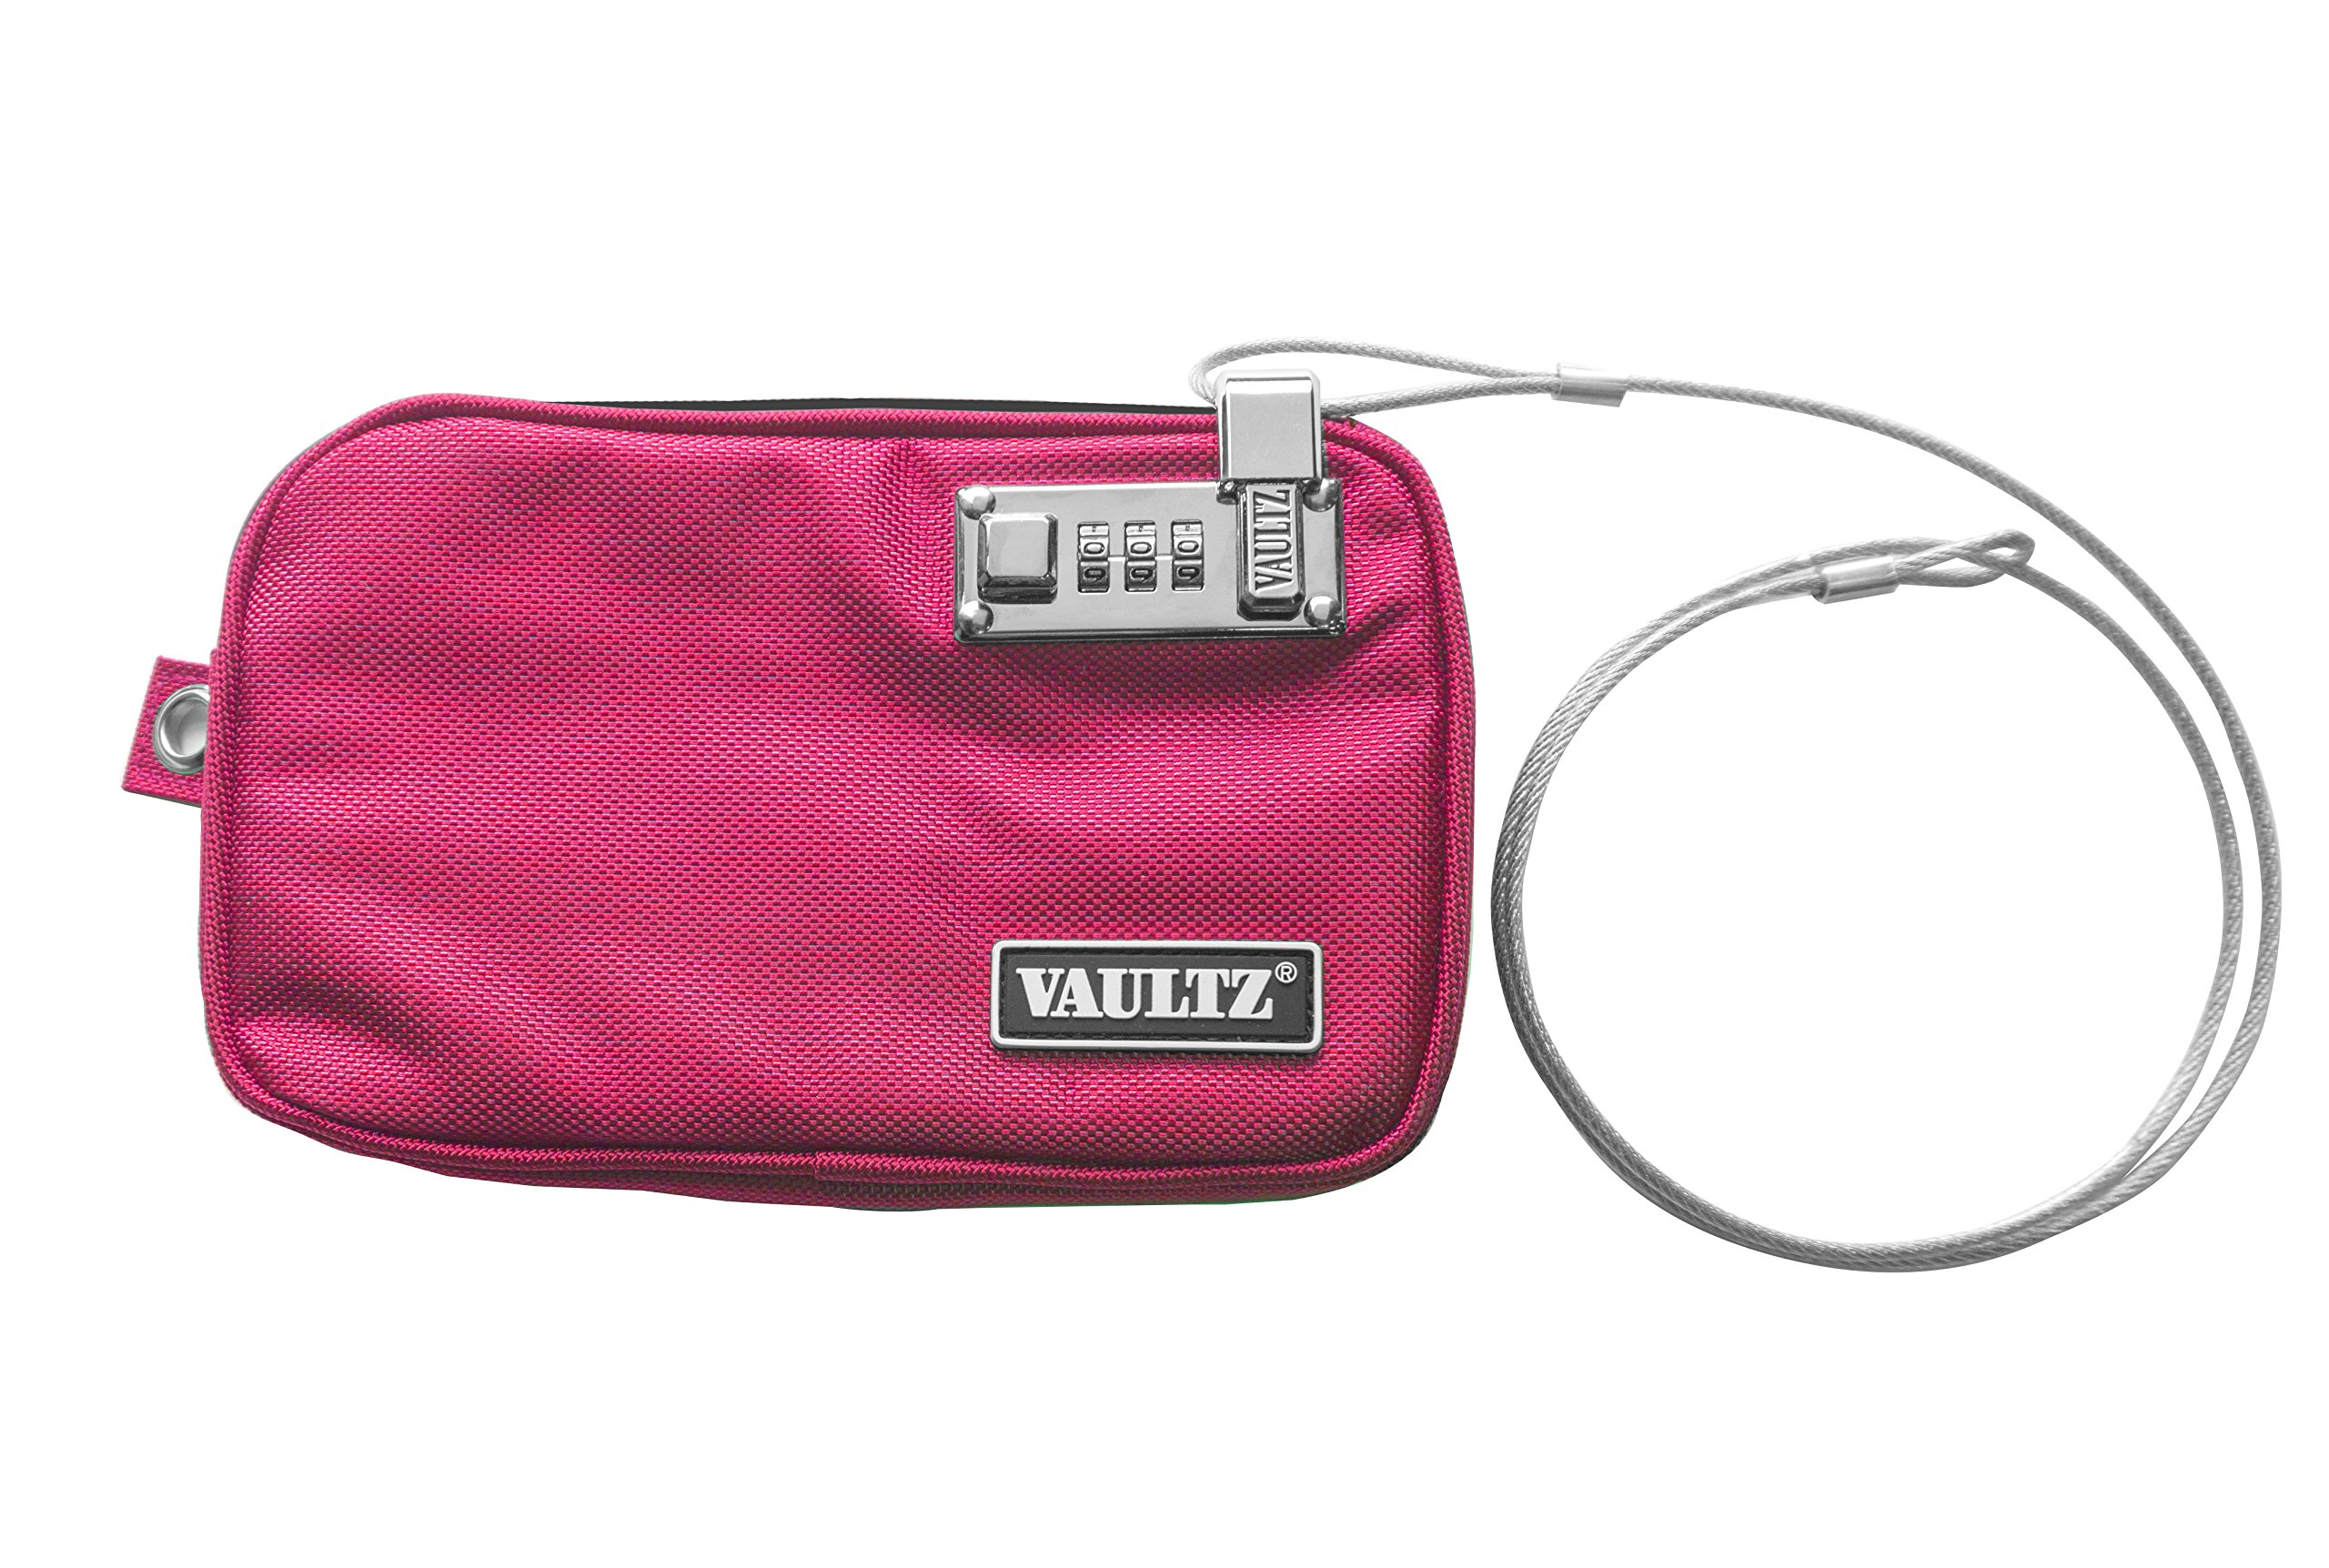 Vaultz Small Locking Electronics Pouch, 5 x 8'', Pink (VZ03432)